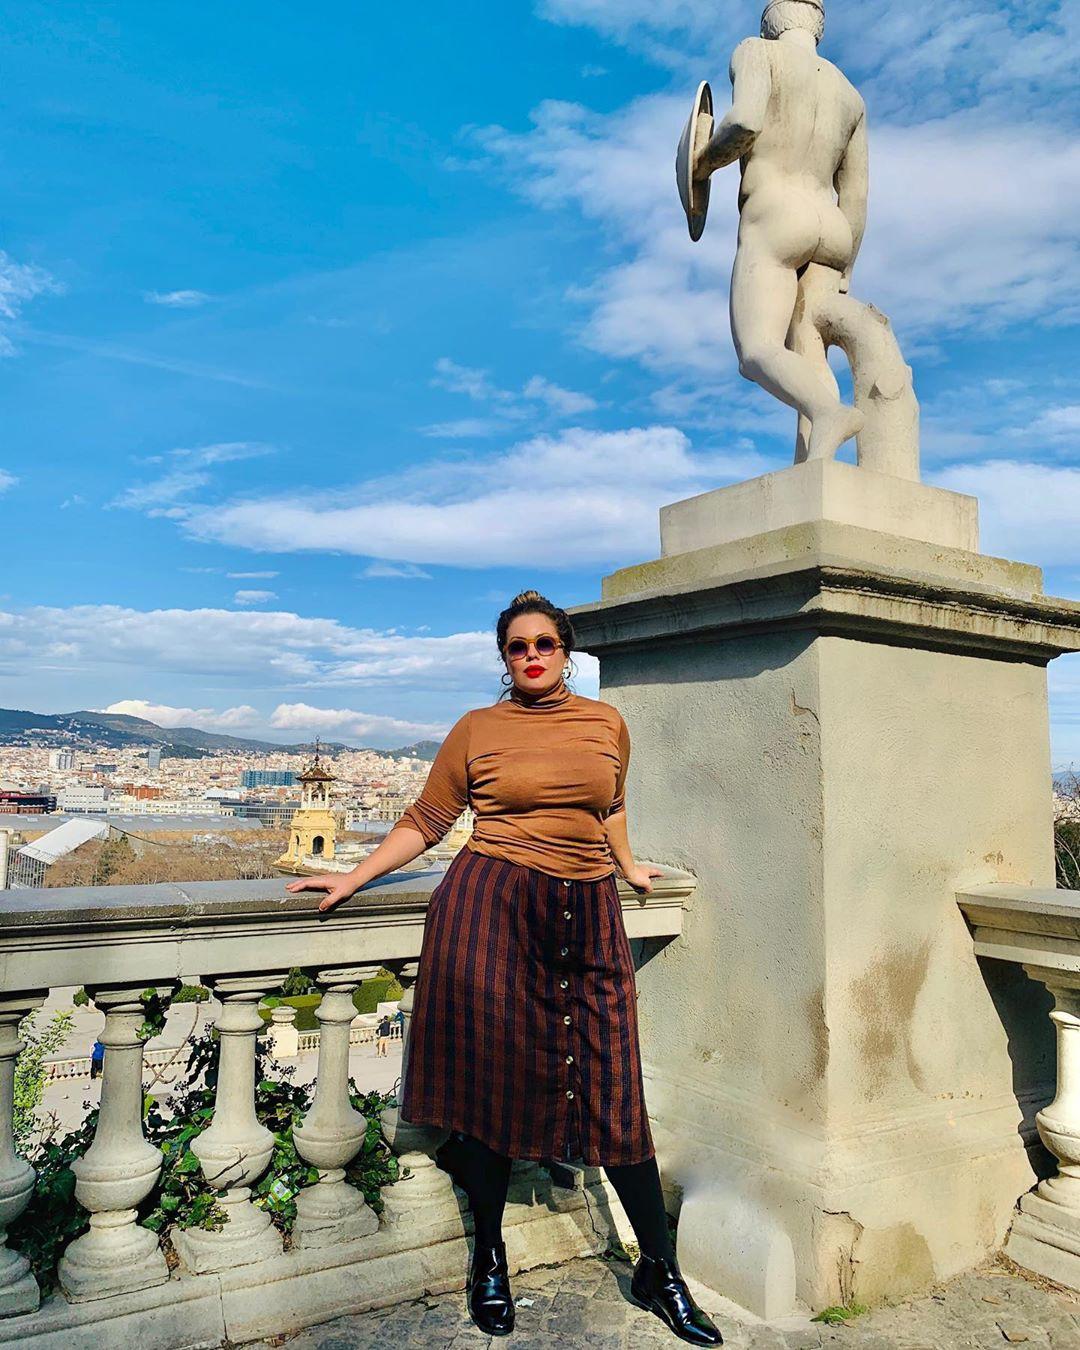 Fluvia Lacerda, classical sculpture, sculpture, memorial